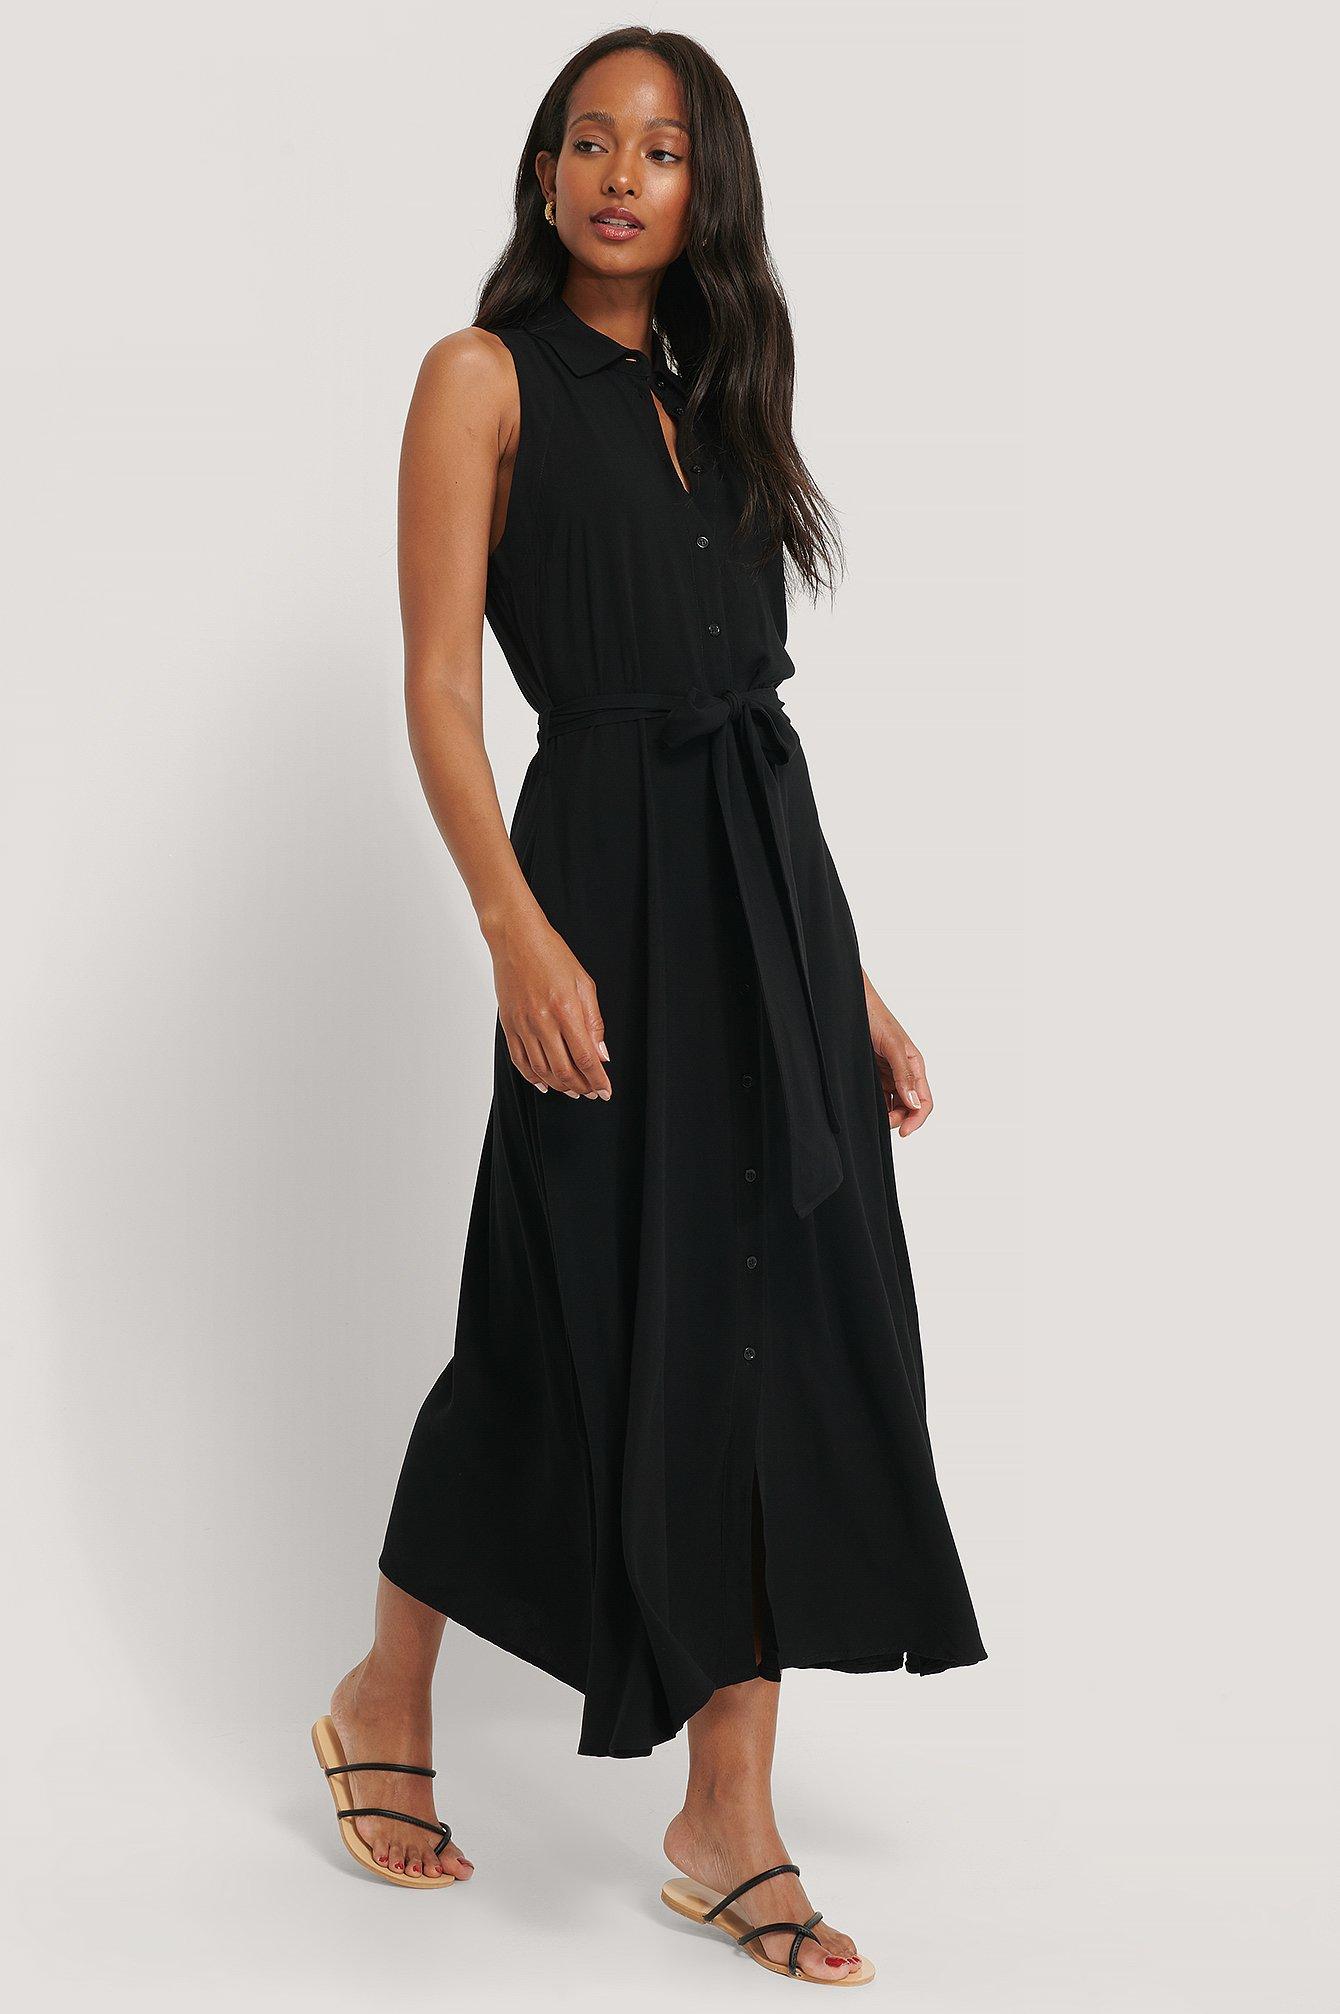 Ärmelloses Kleid Schwarz | na-kd.com